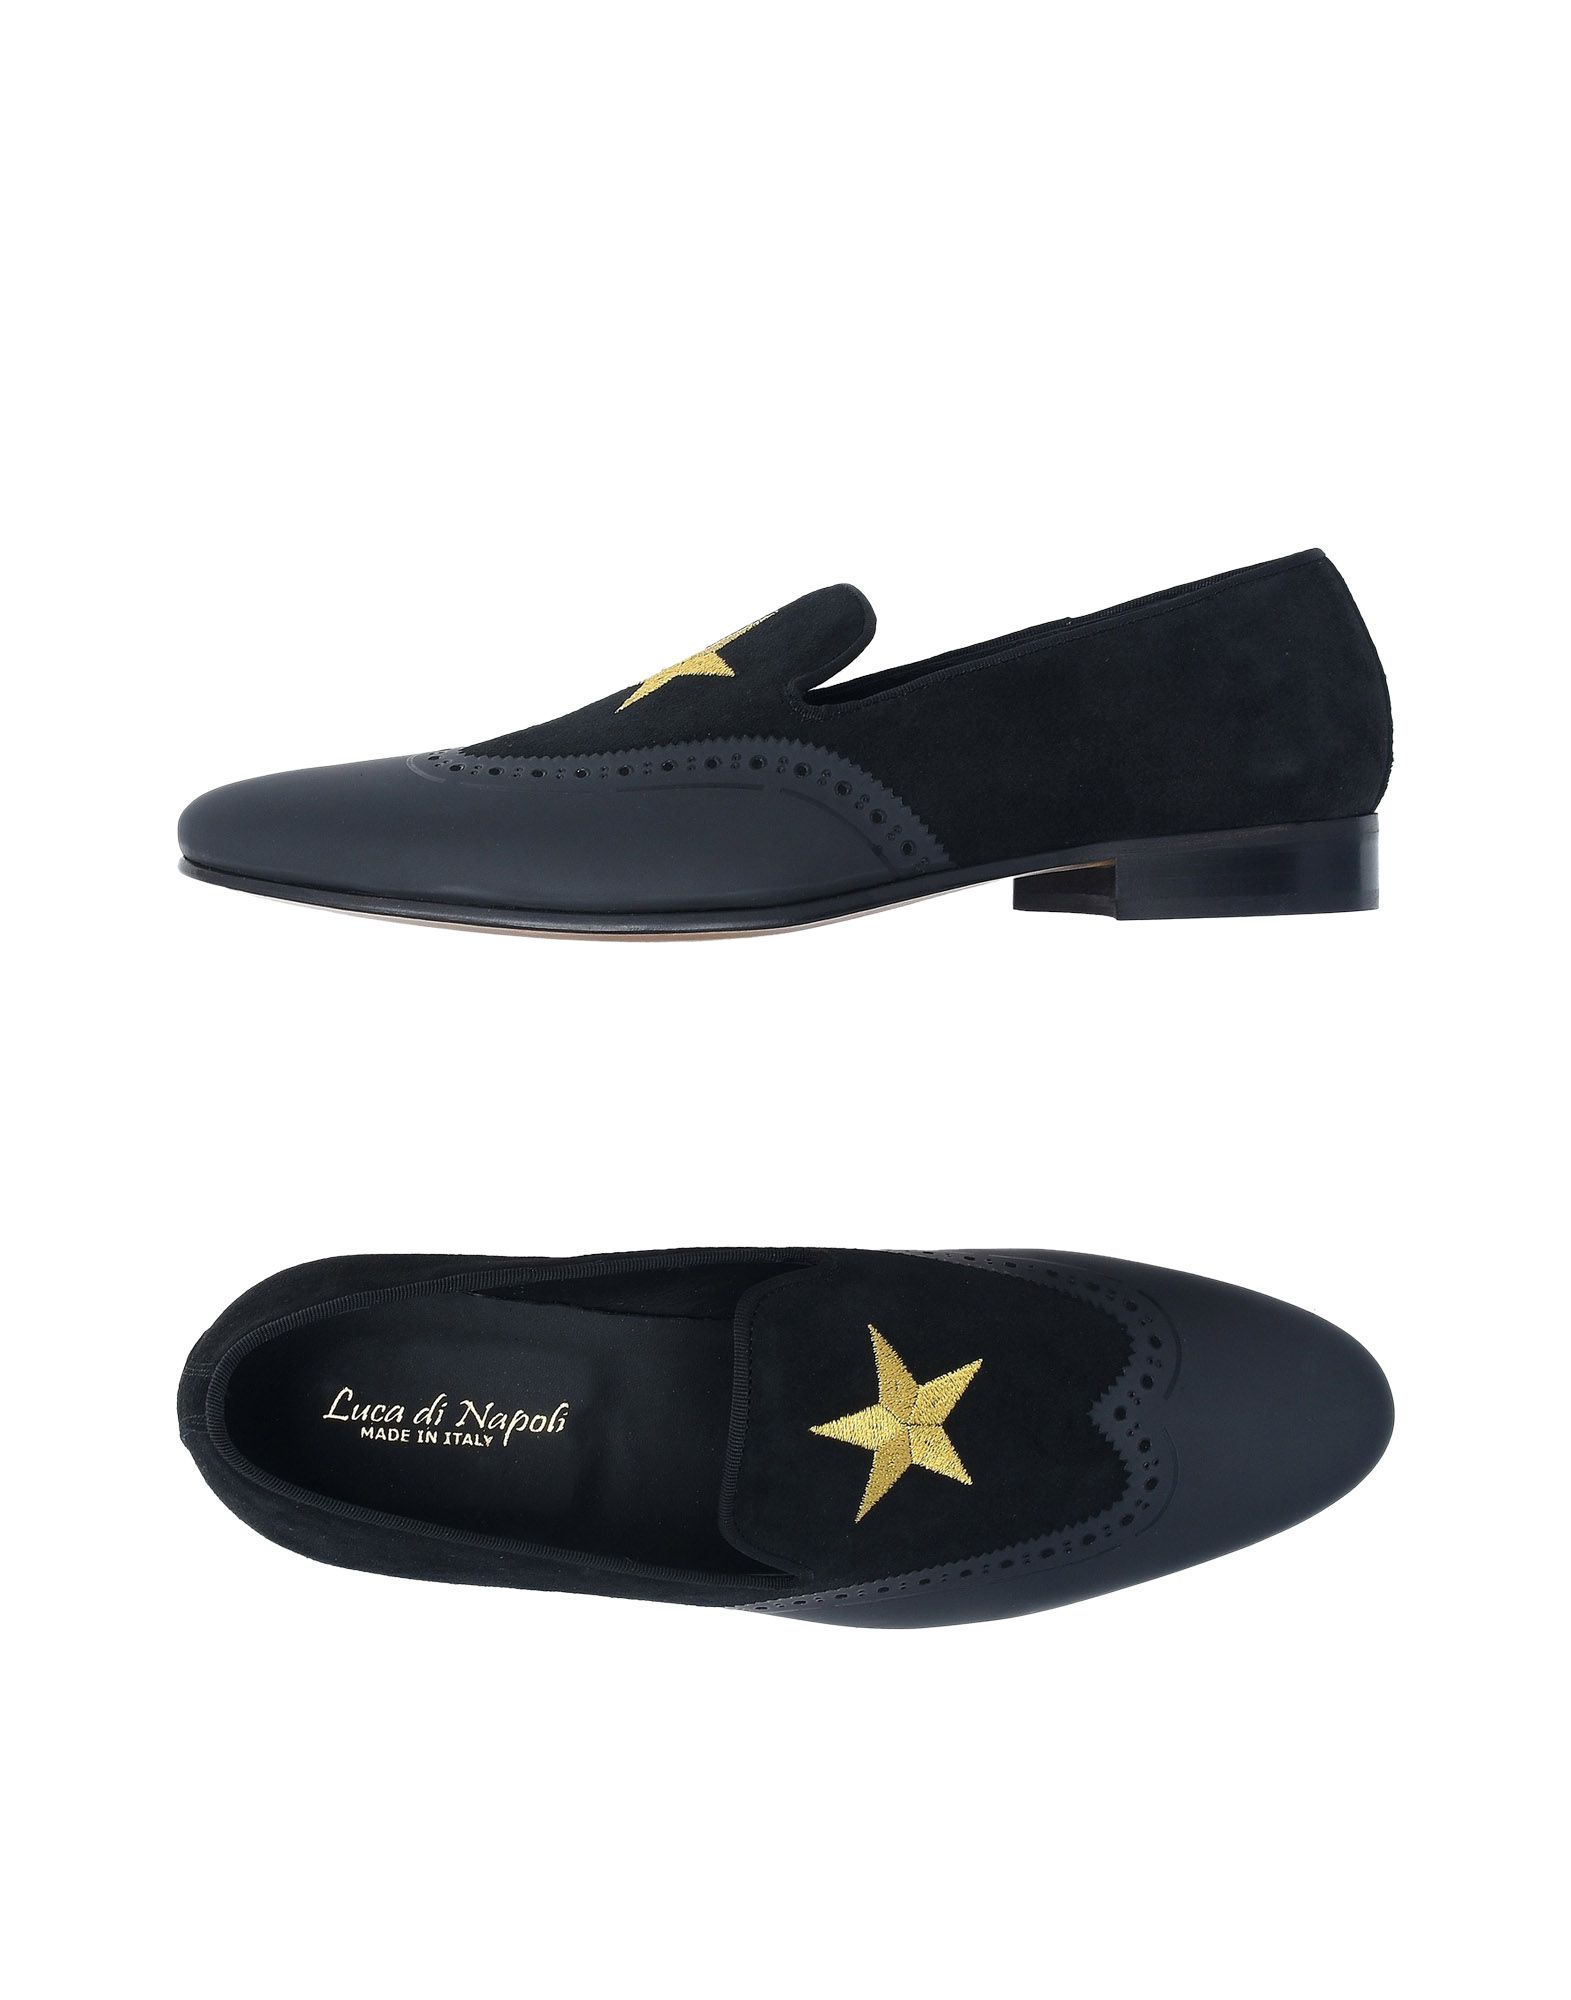 Luca Di Napoli Mokassins Herren  11514905BL Gute Qualität beliebte Schuhe